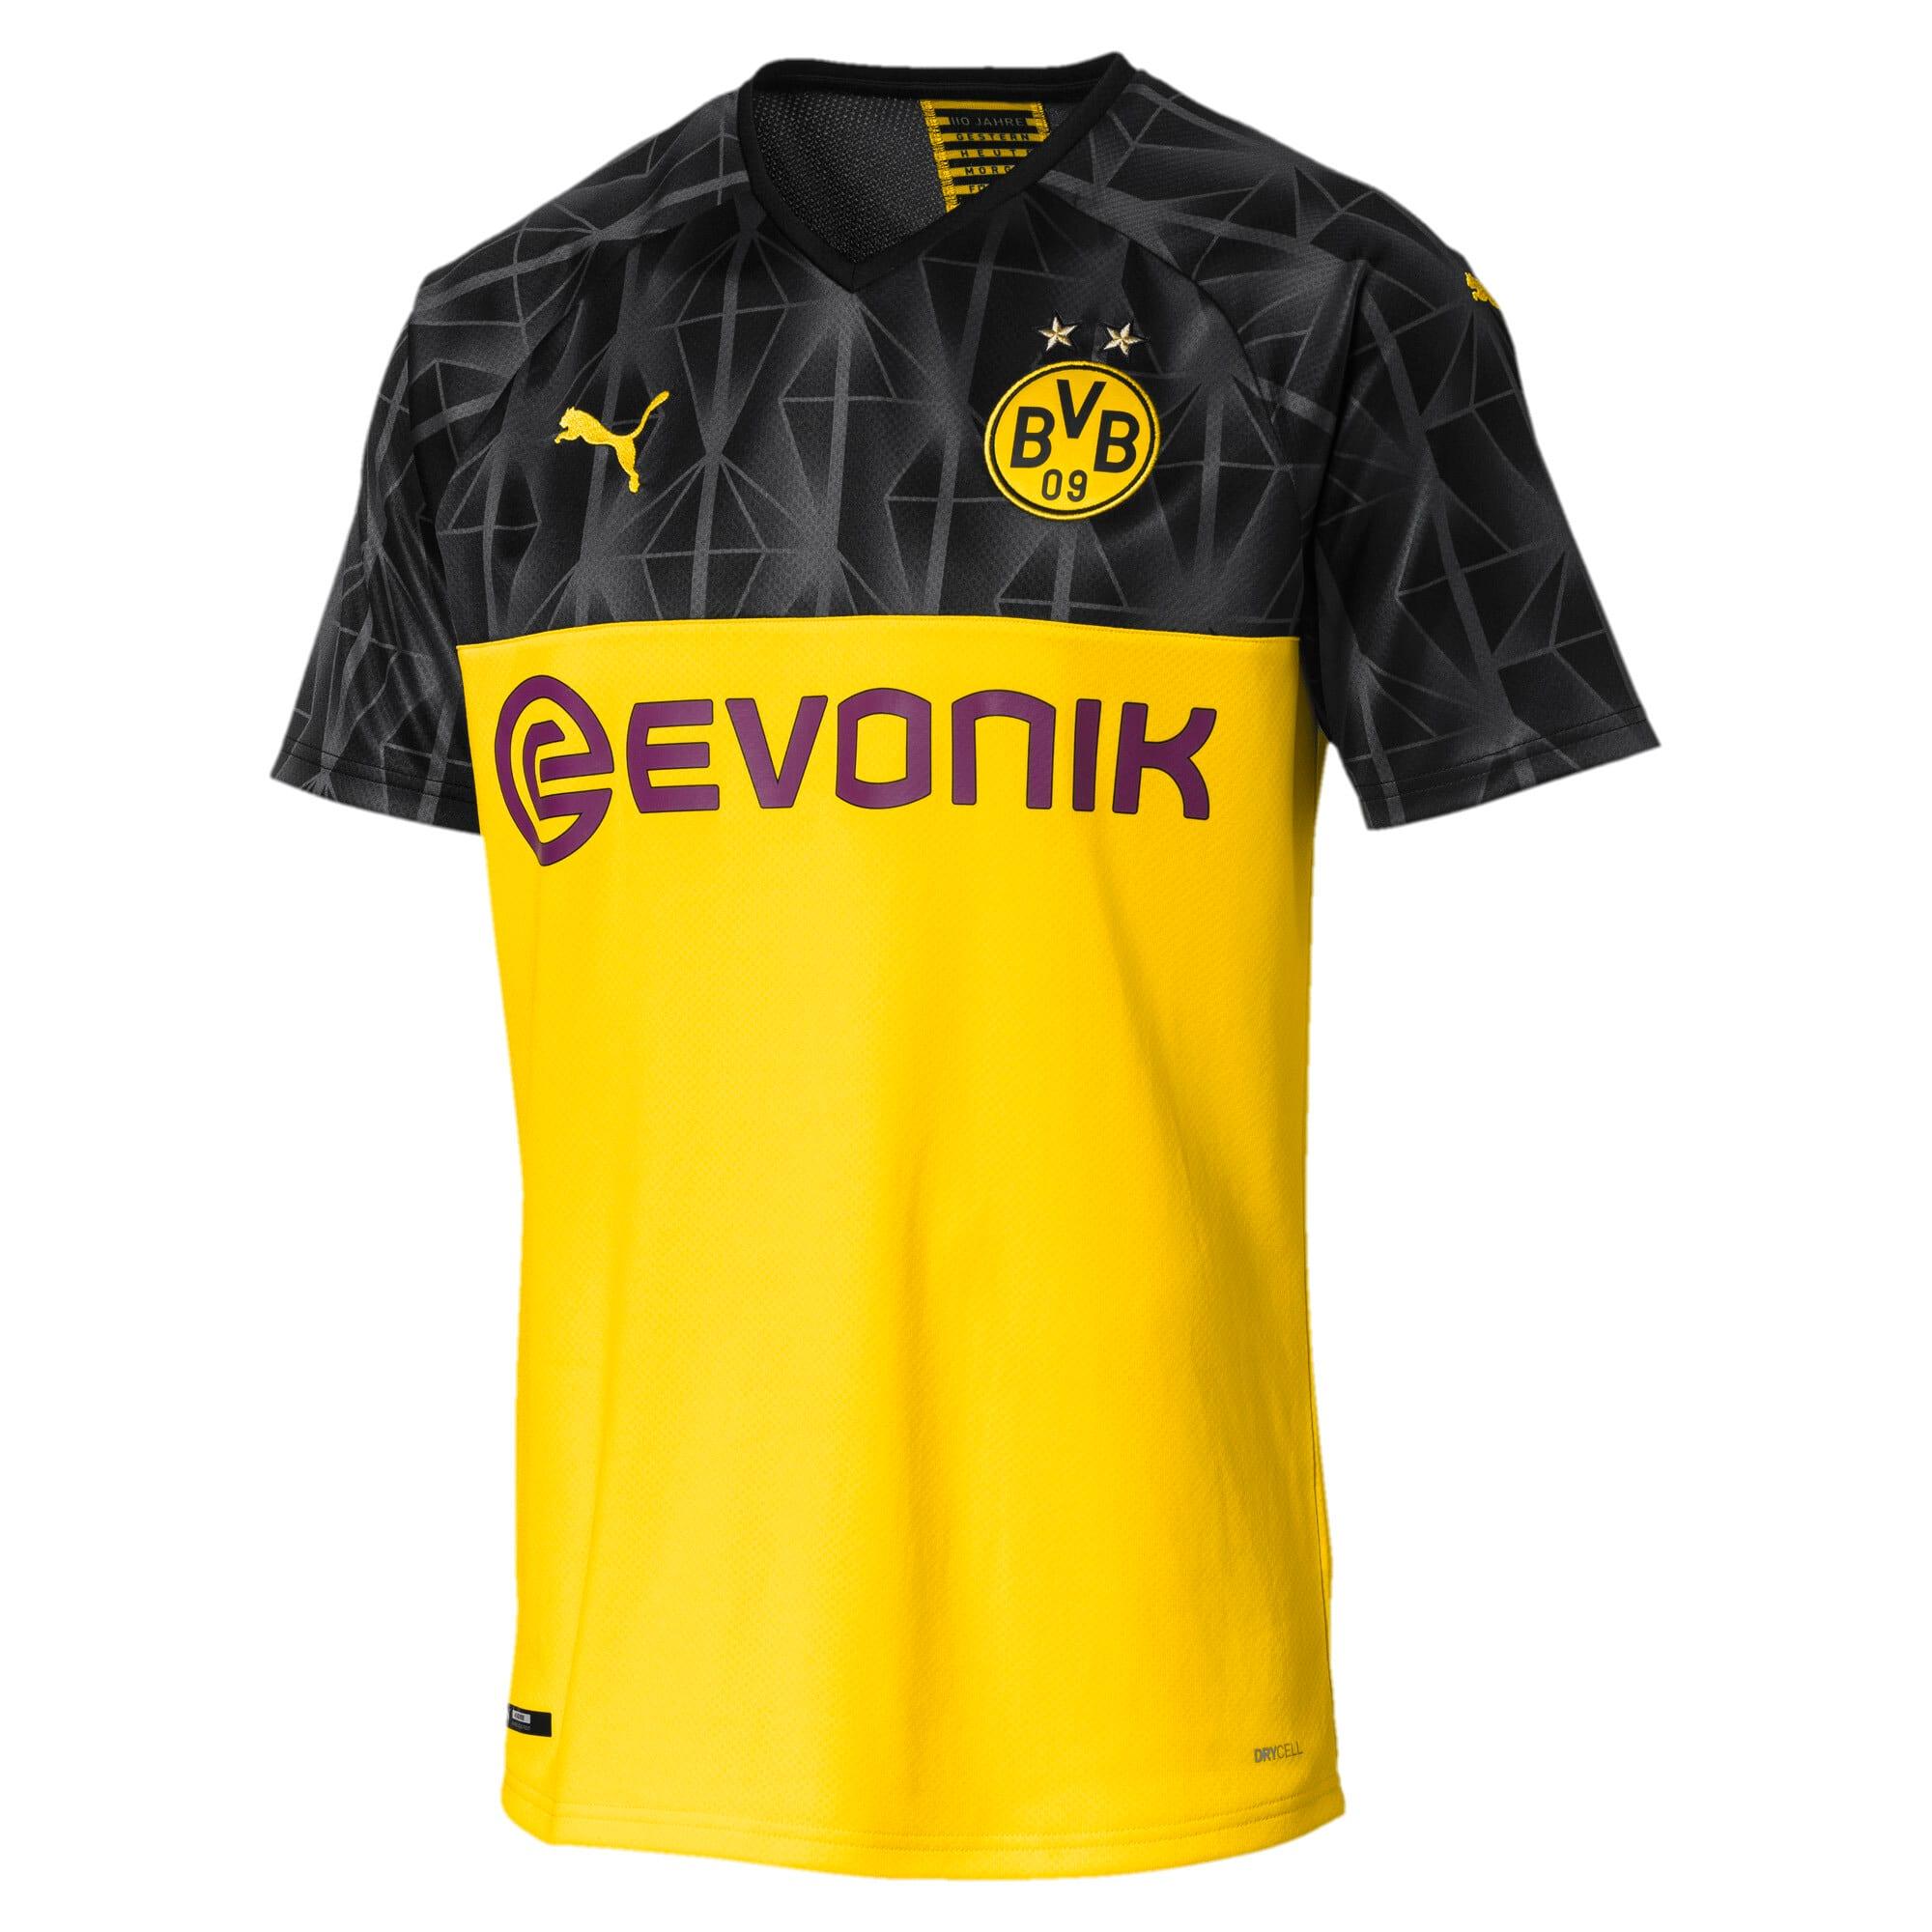 Thumbnail 1 of BVB Men's Replica Cup Jersey, Cyber Yellow-Puma Black, medium